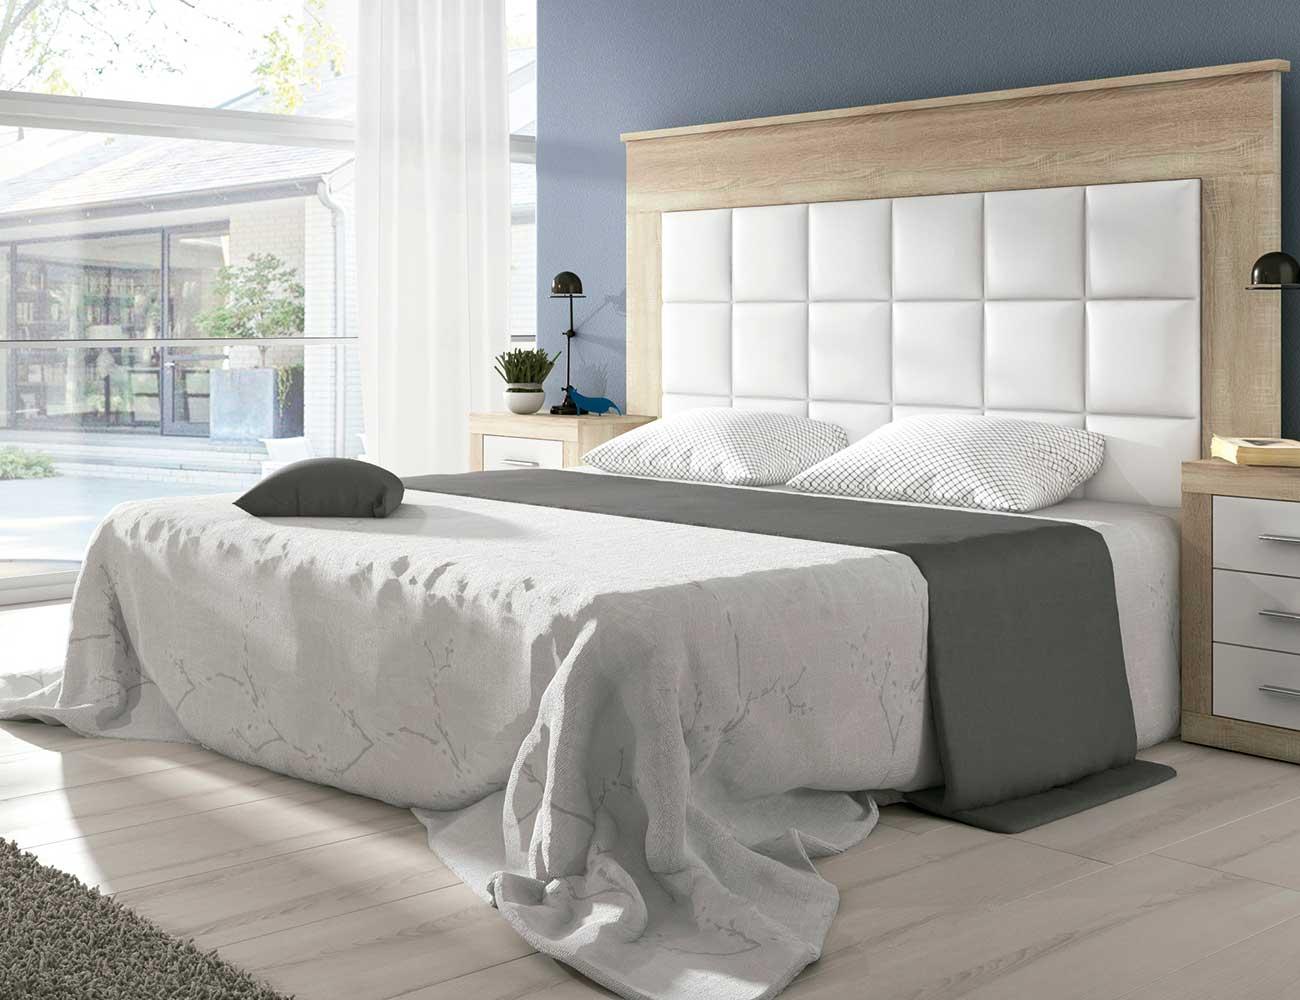 Cabecero dormitorio matrimonio moderno patas plafon pu cambrian blanco